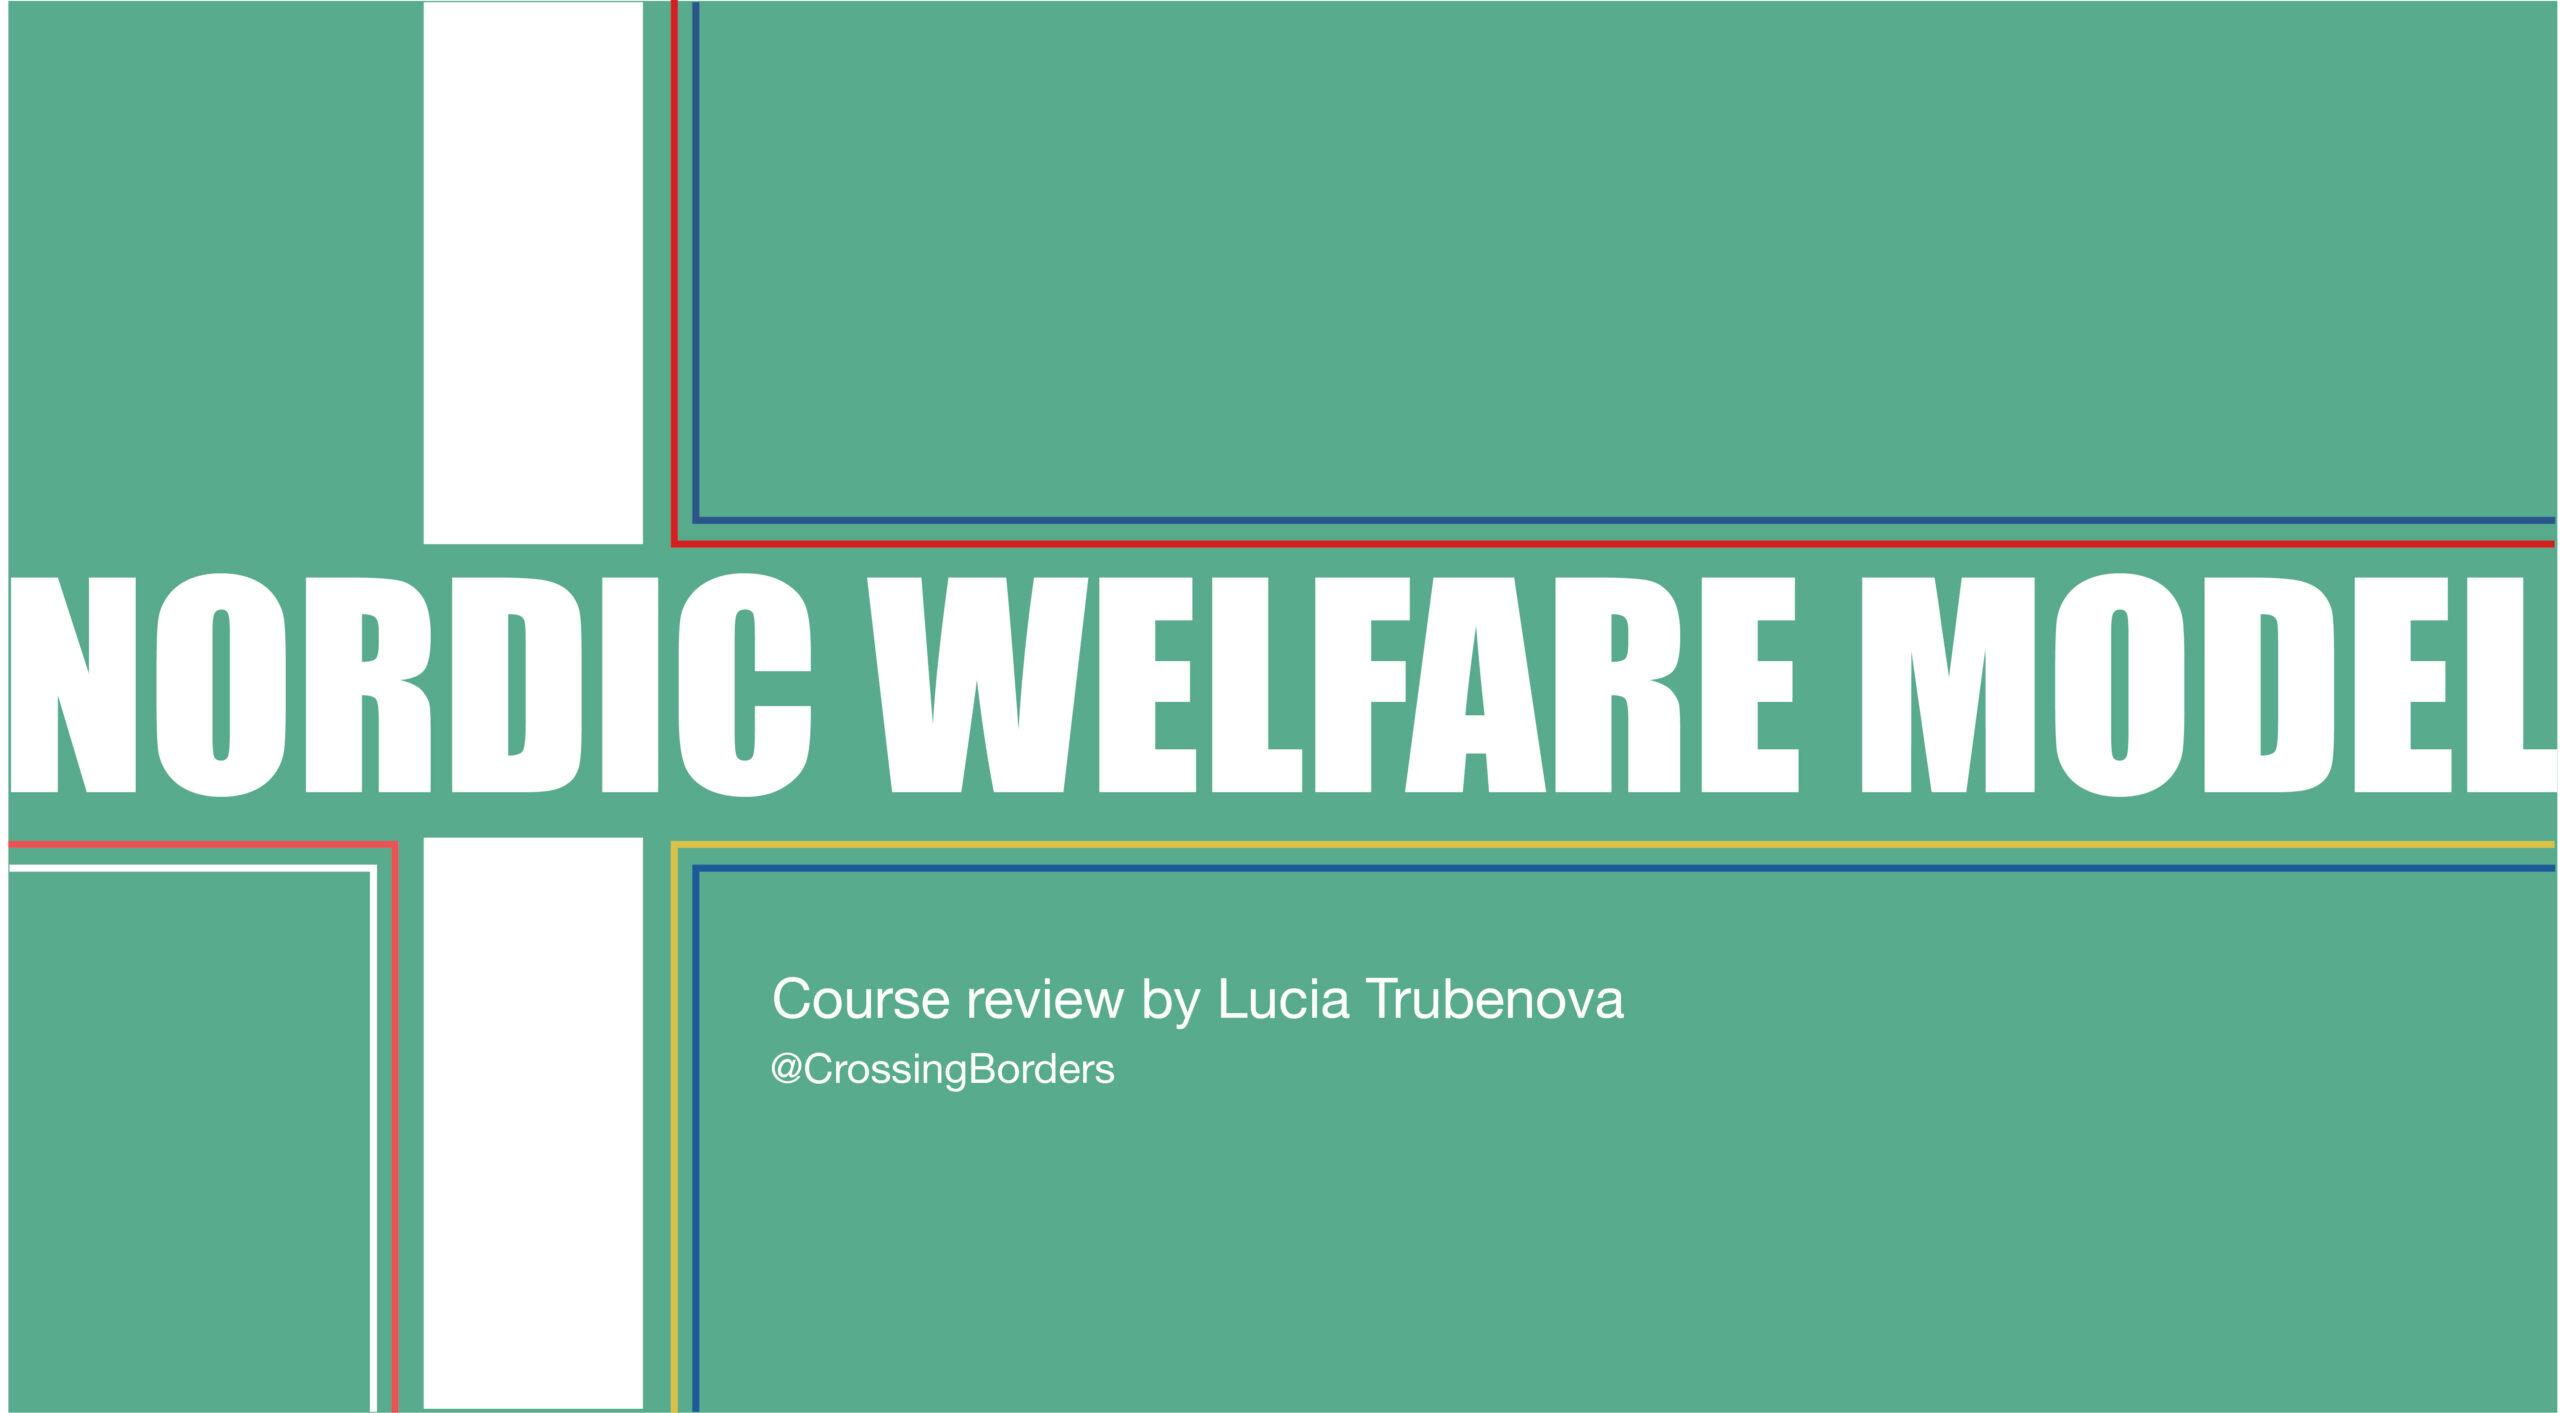 About the Nordic Welfare Model Course – By Lucia Trubenova